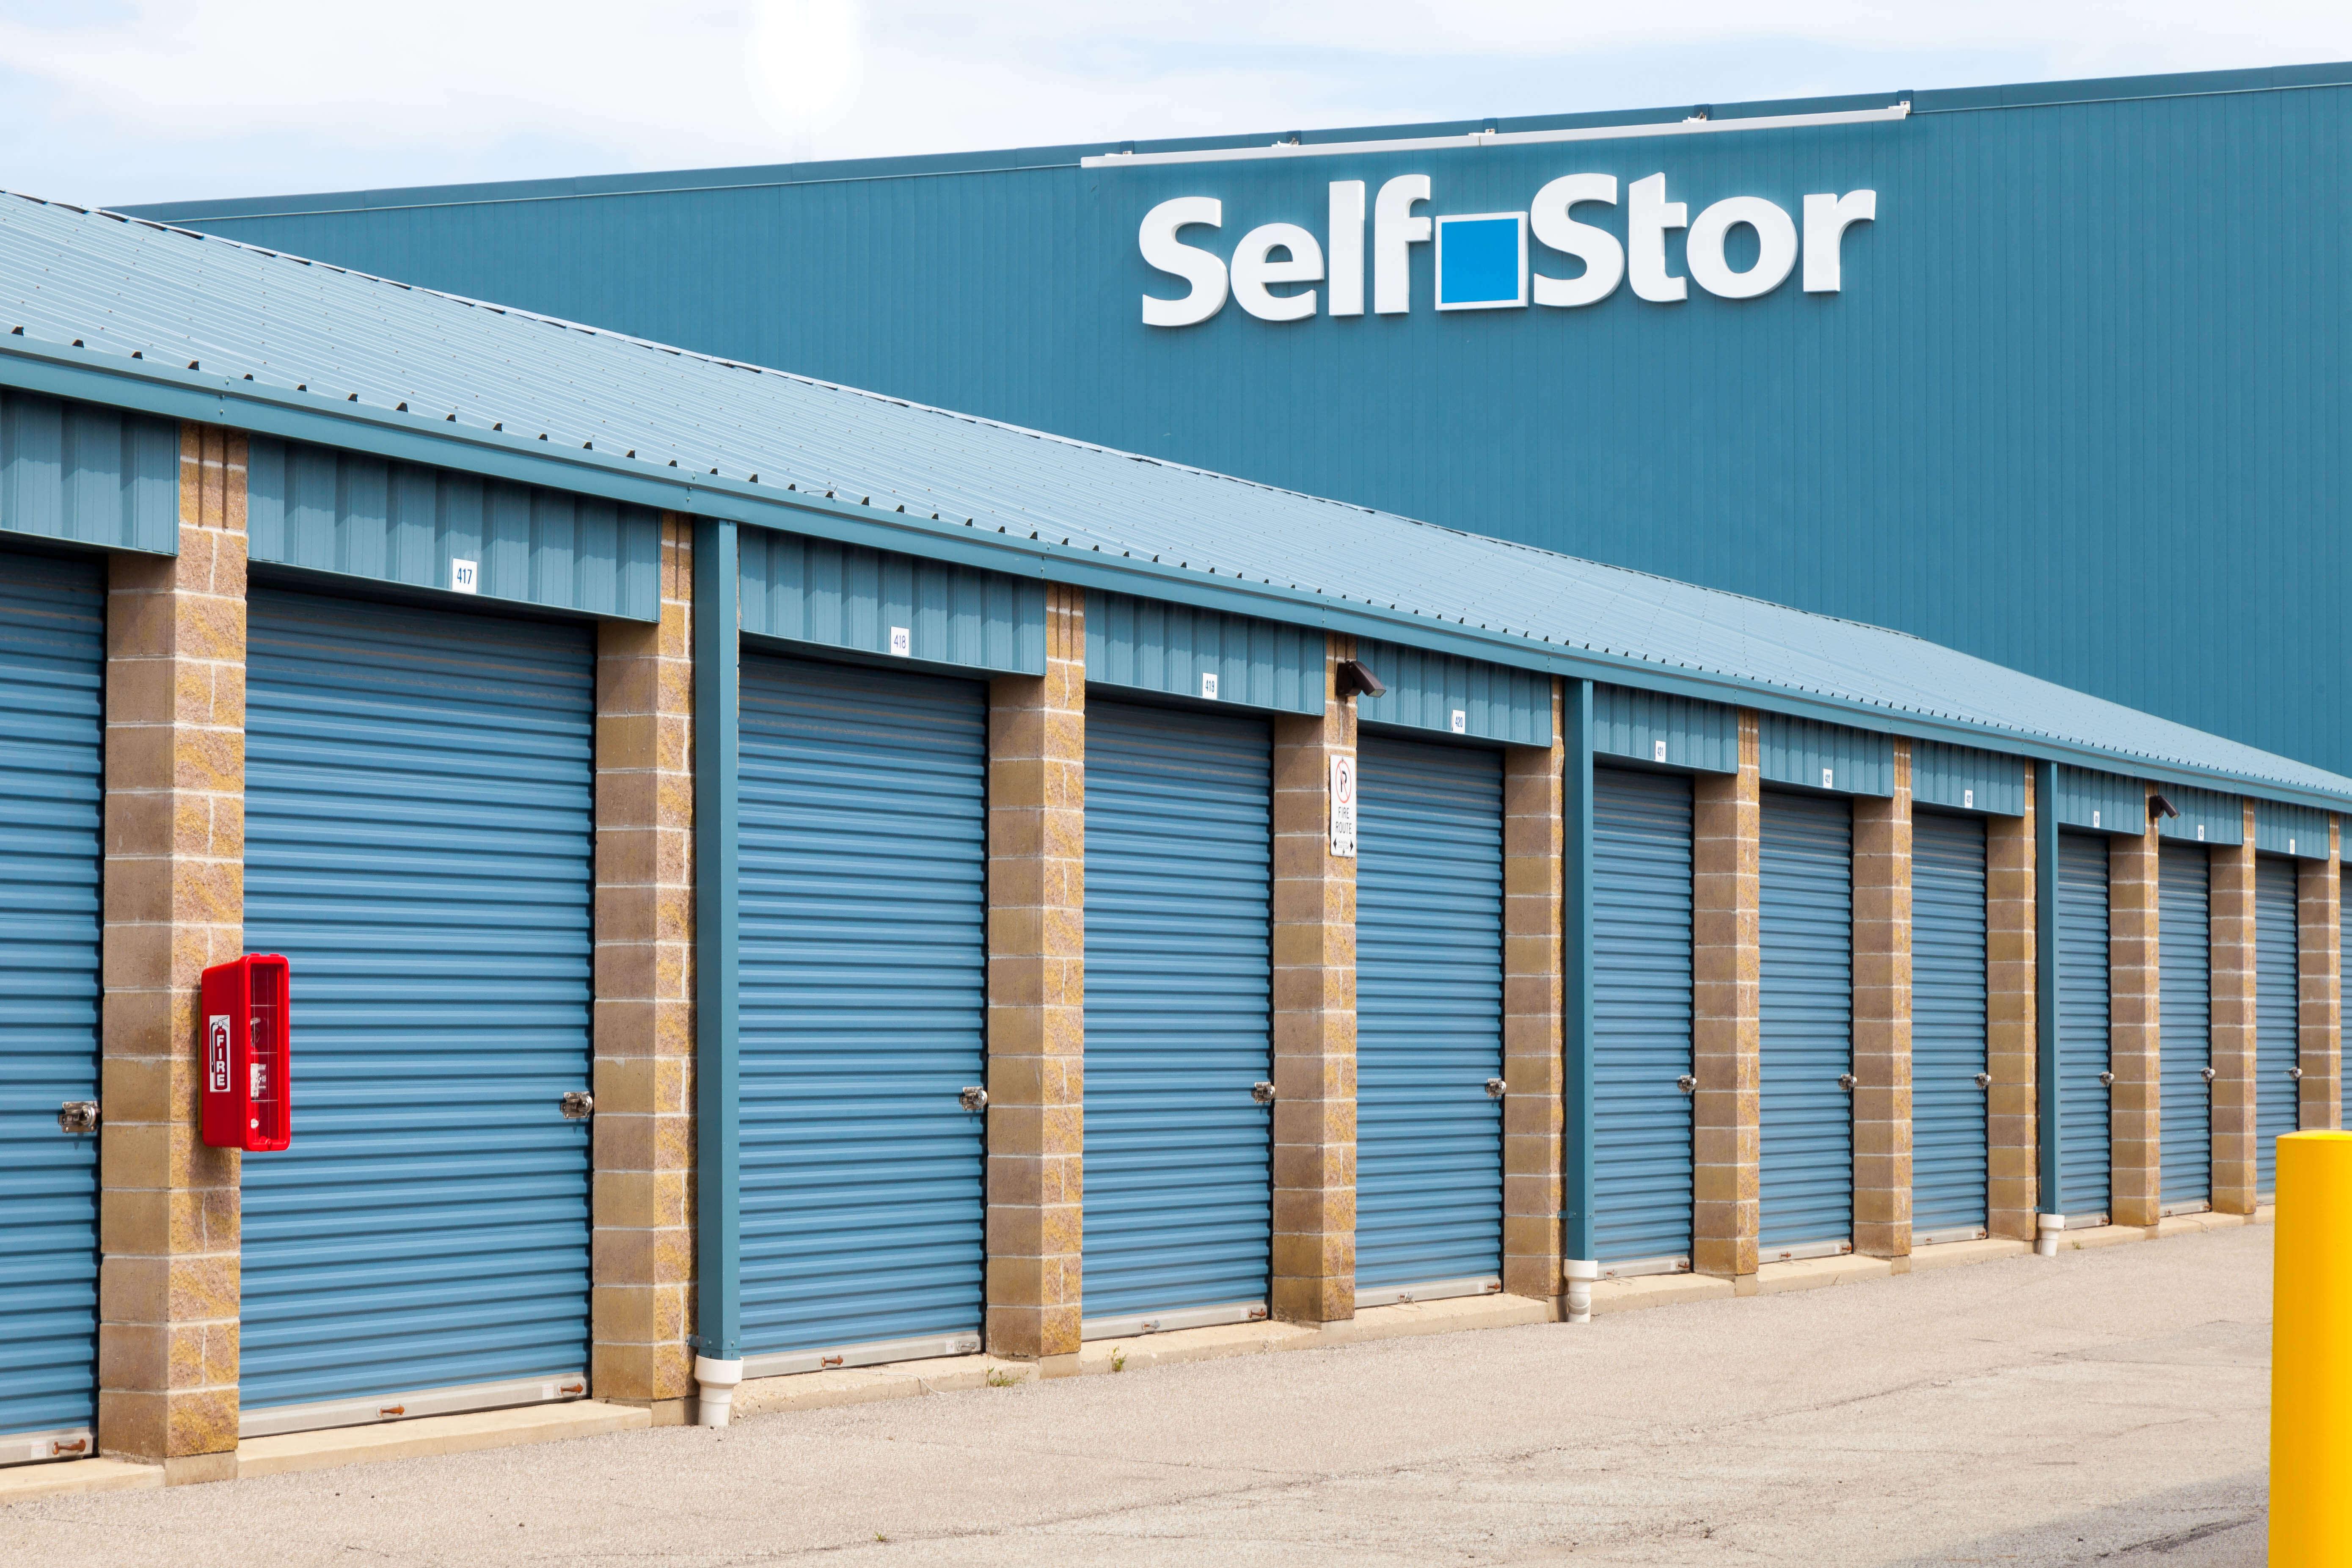 Self Stor toronto west self storage